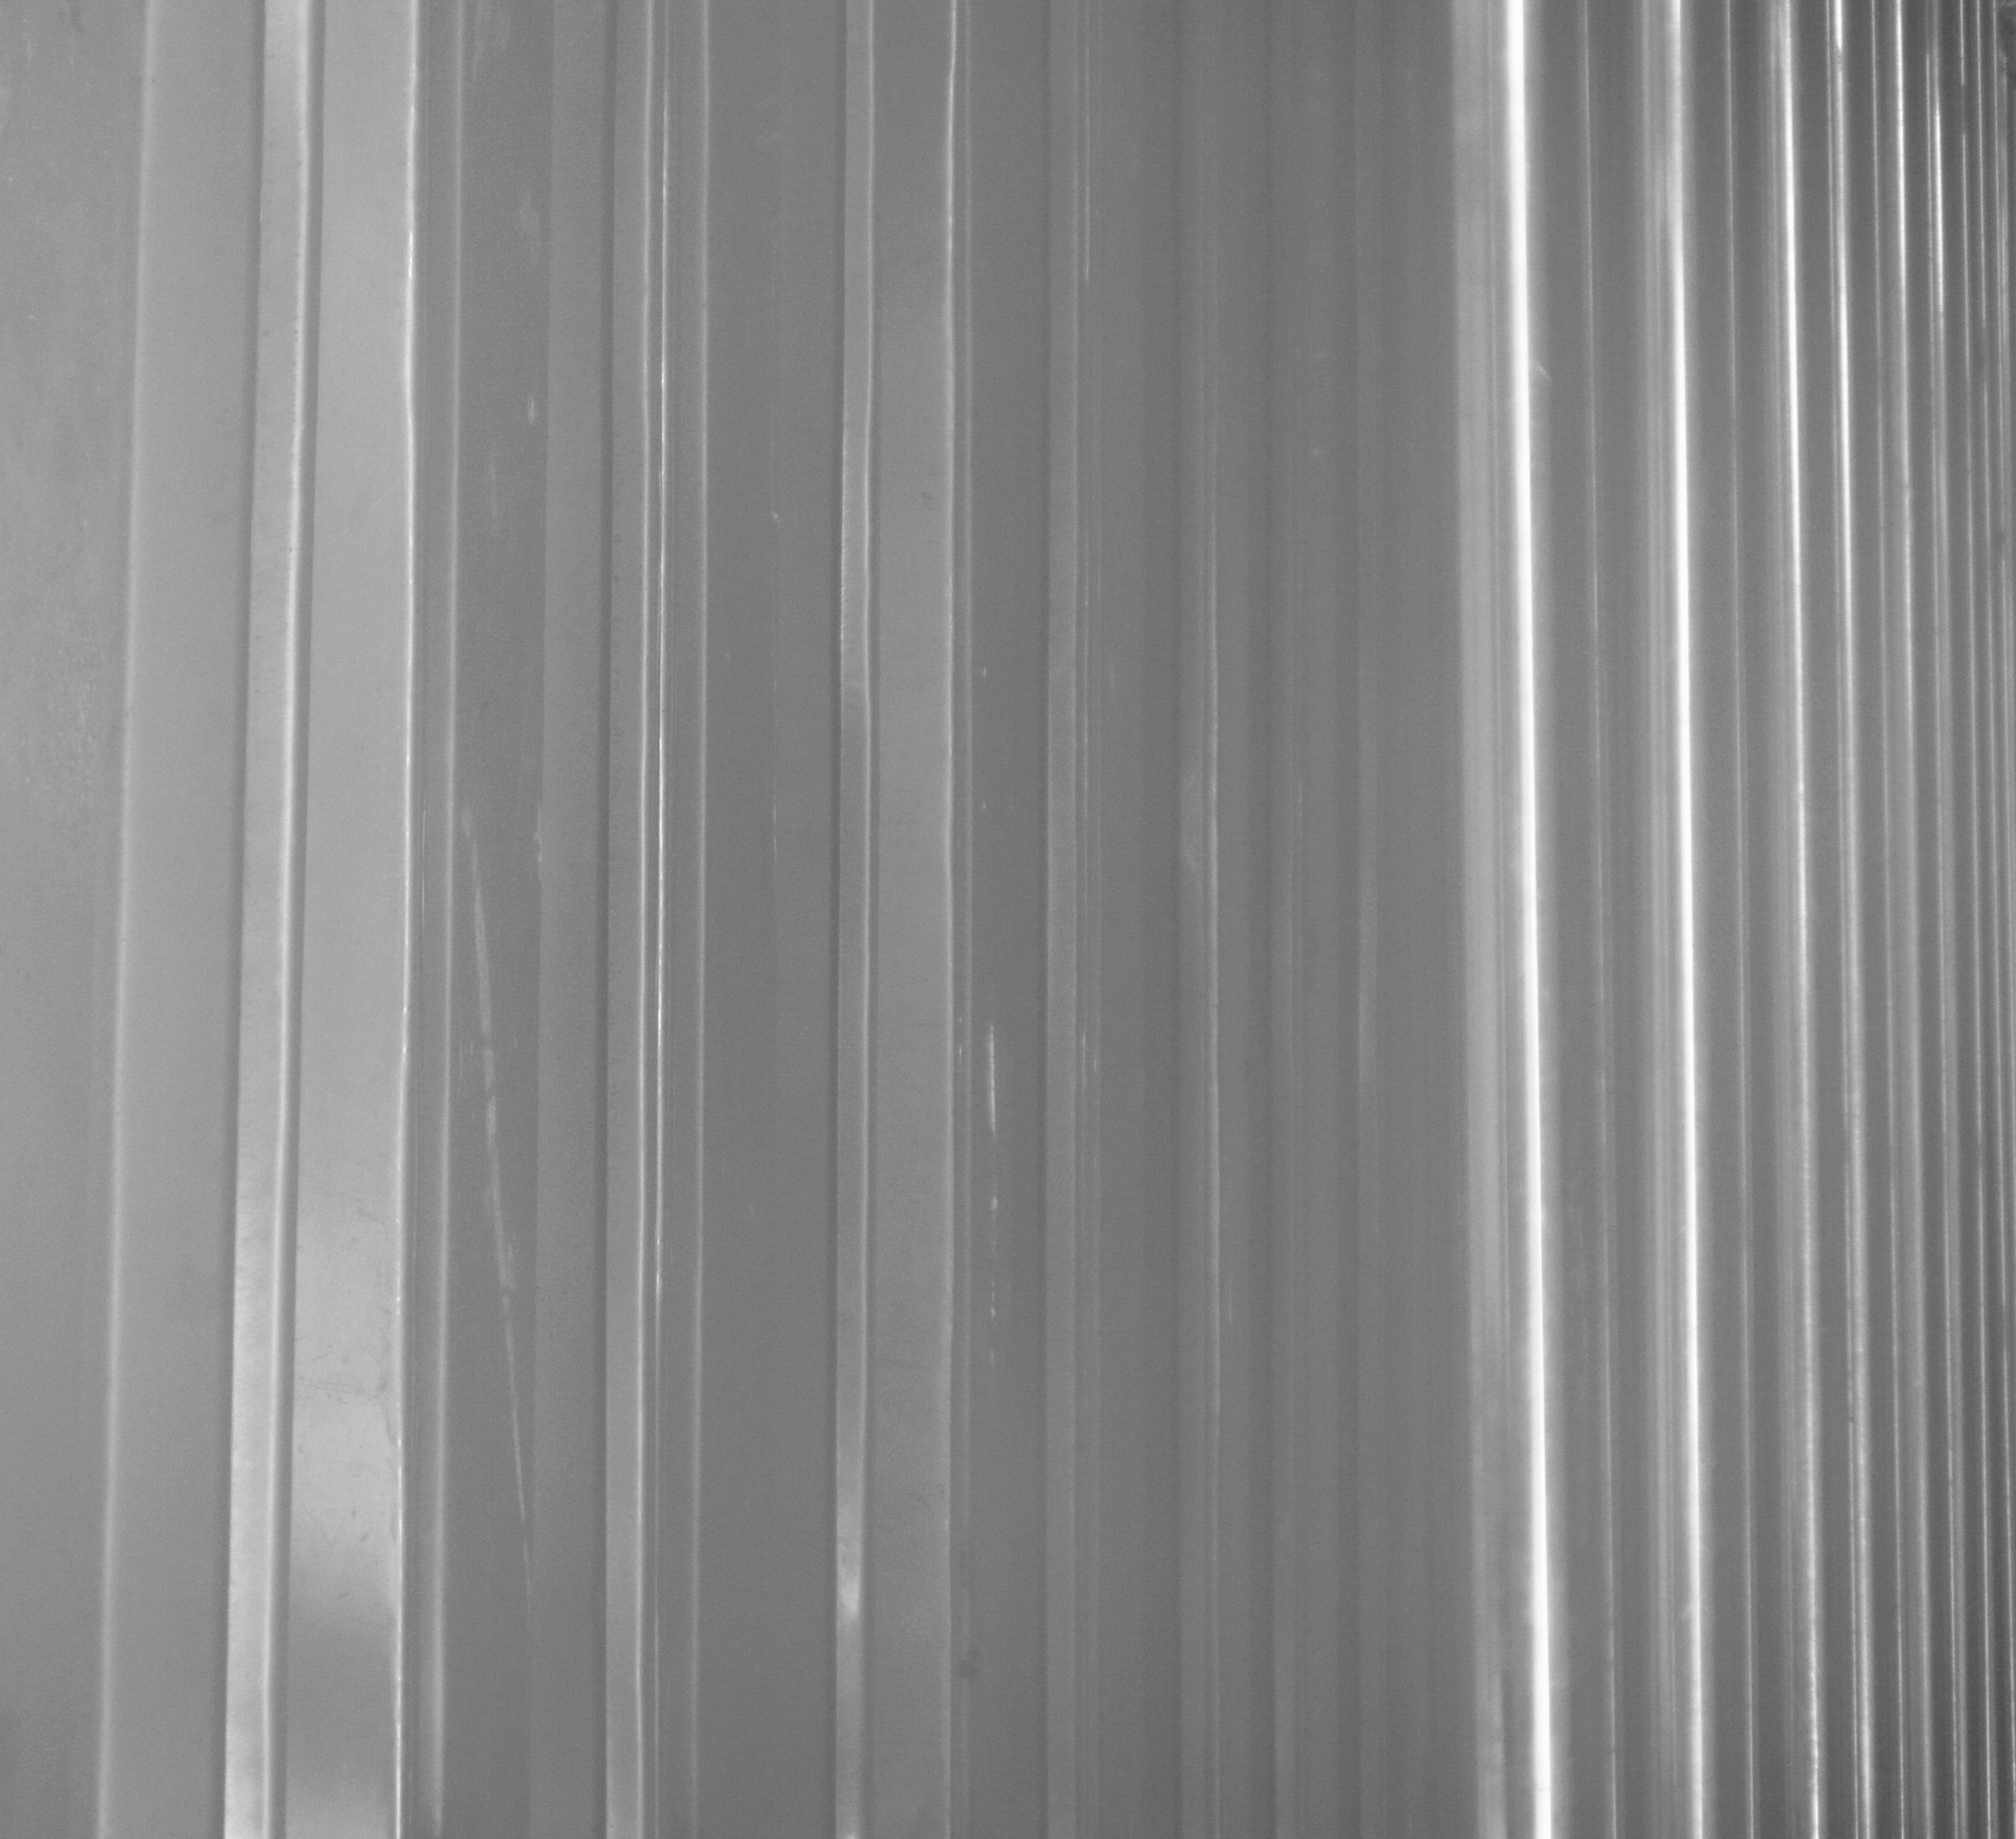 Horizontal metal panels background photo